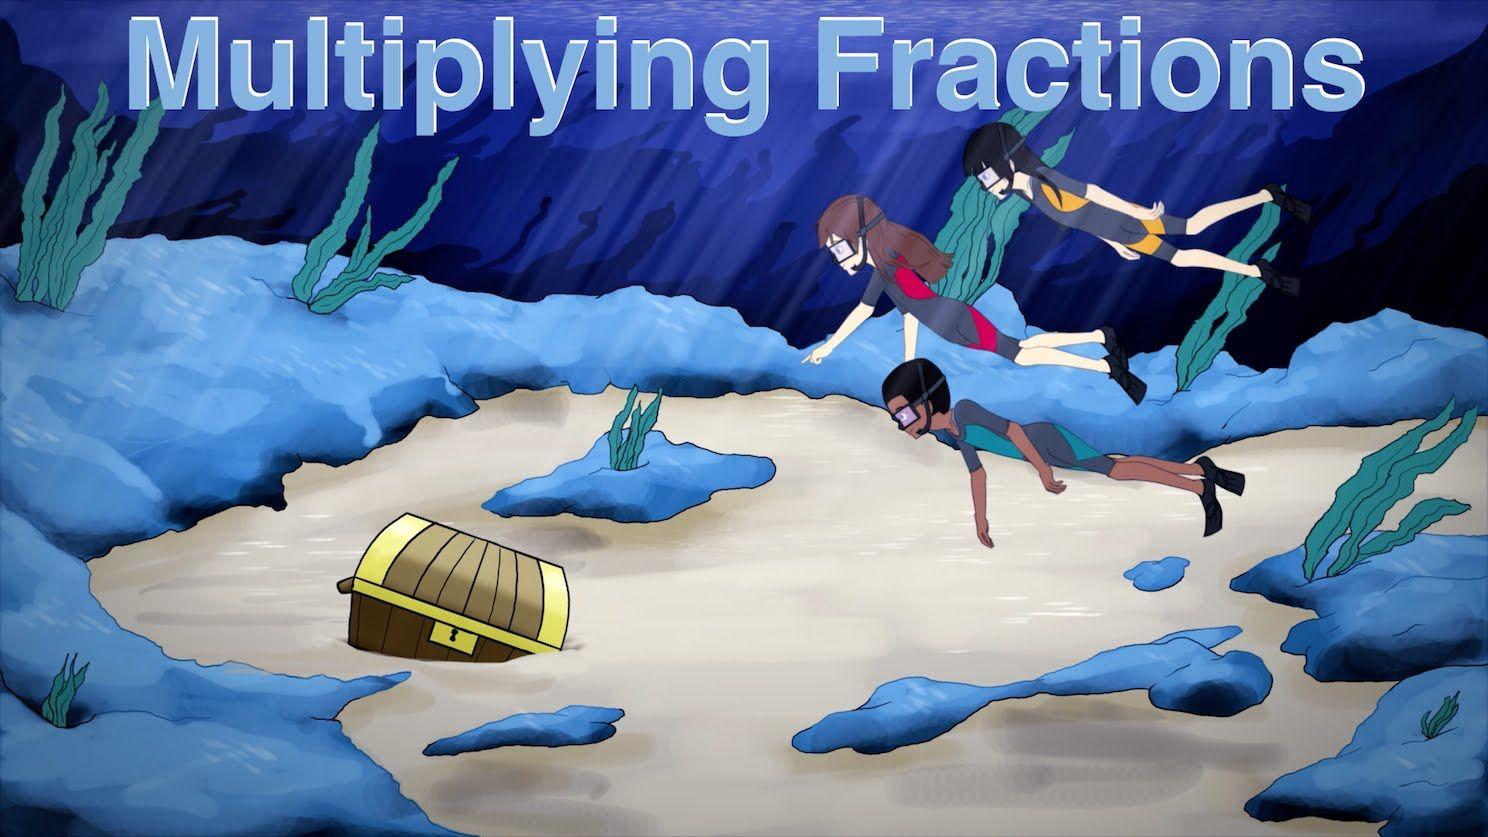 Multiplying Fractions Song Cartoon Rap Video For